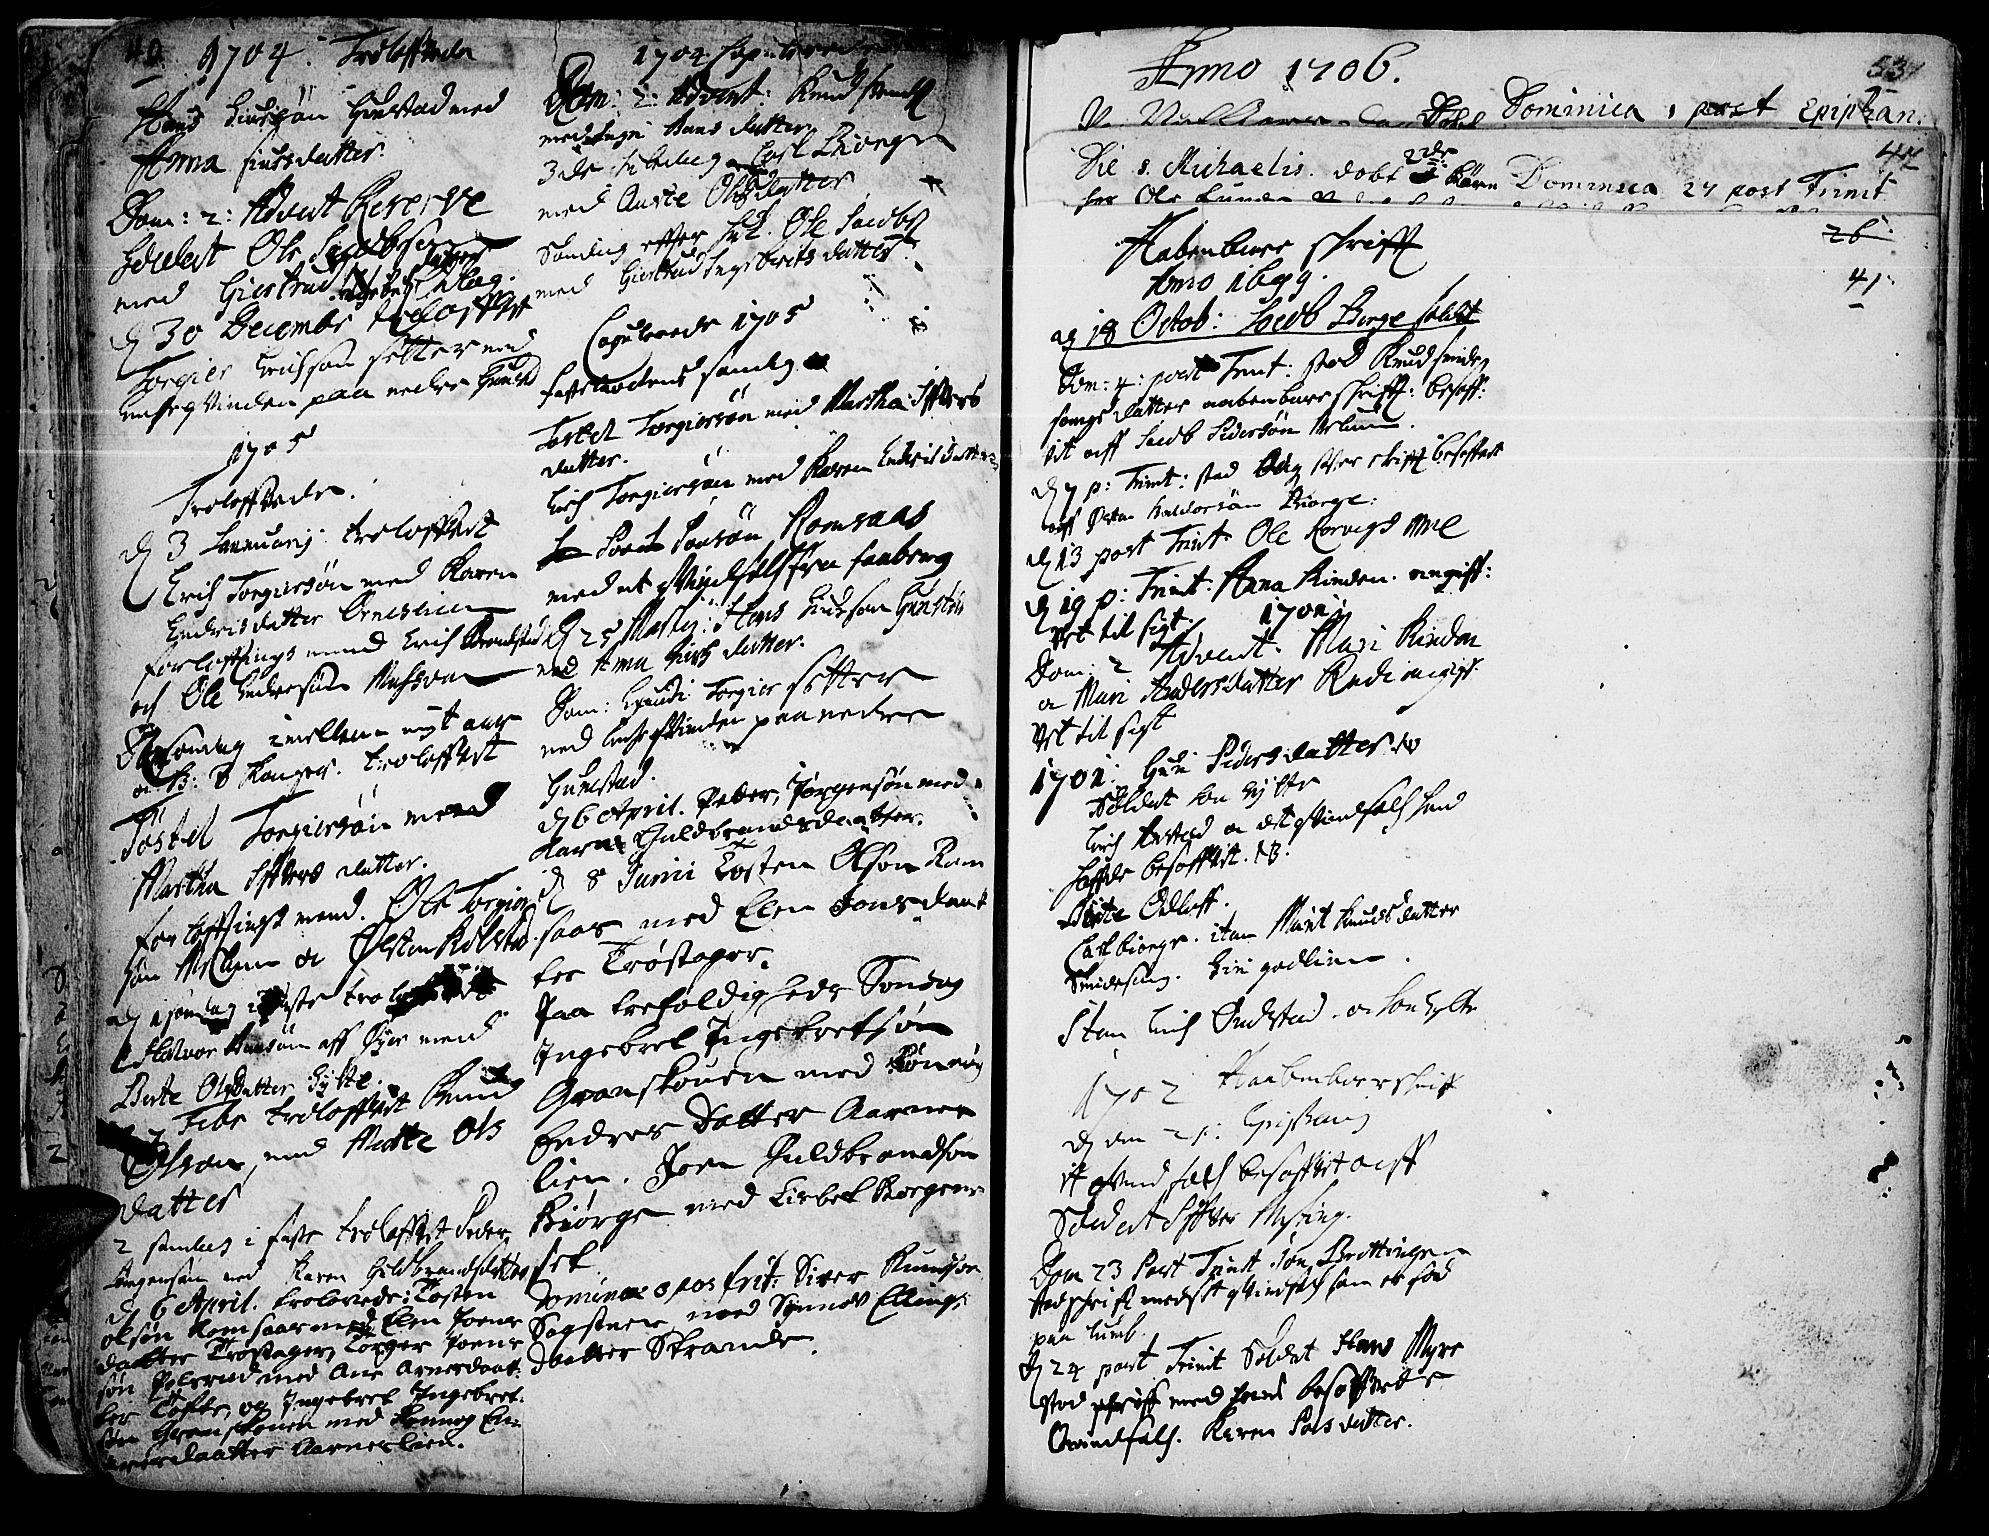 SAH, Ringebu prestekontor, Ministerialbok nr. 1, 1696-1733, s. 40-41